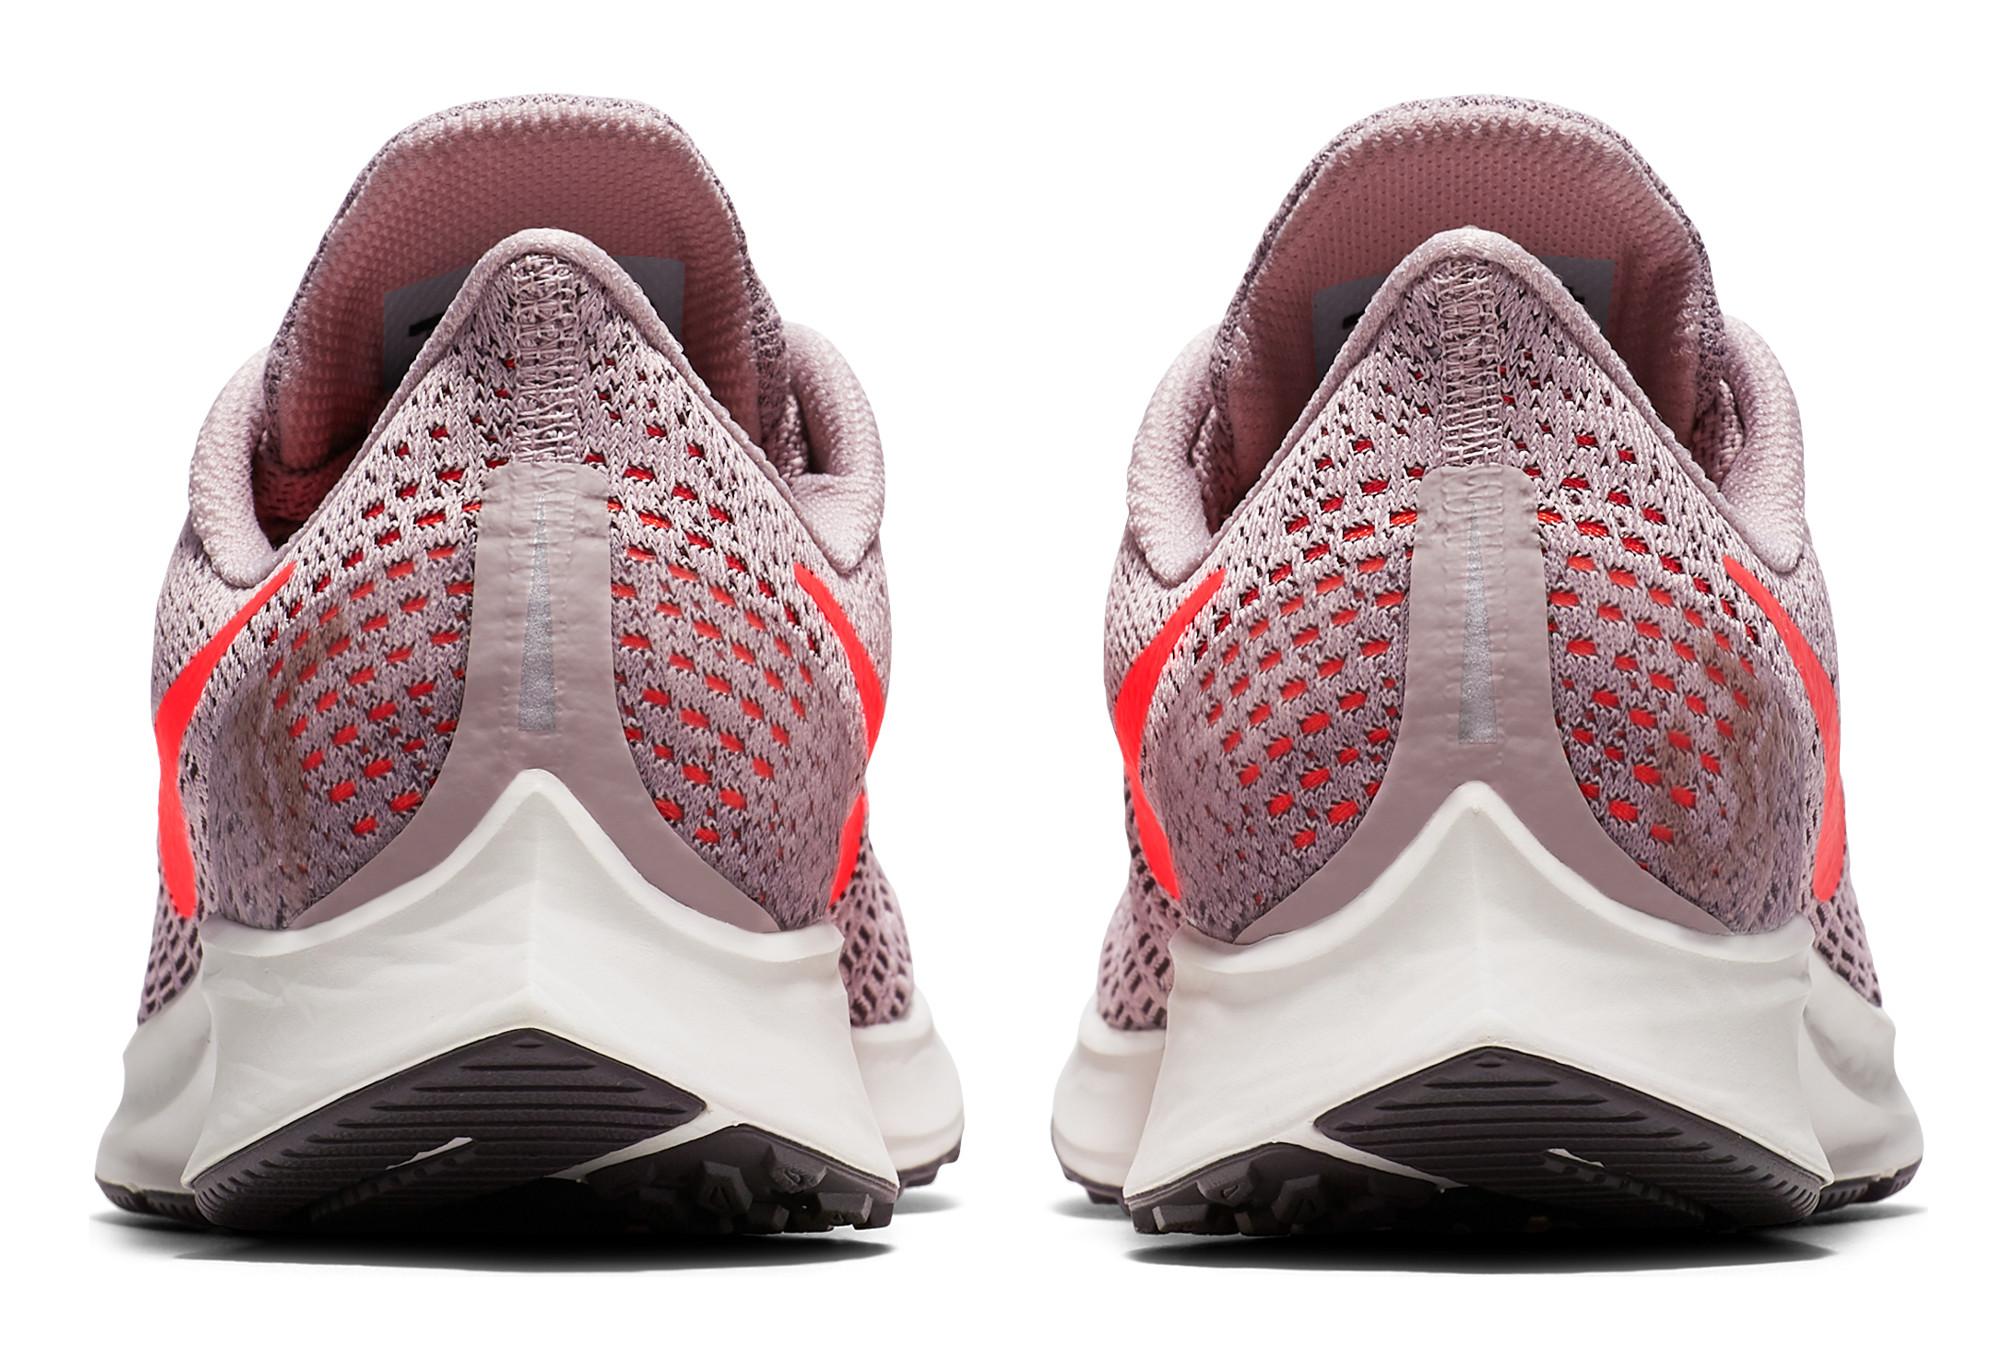 check out 86ff9 8b8ec Chaussures de Running Femme Nike Air Zoom Pegasus 35 Rose   Blanc